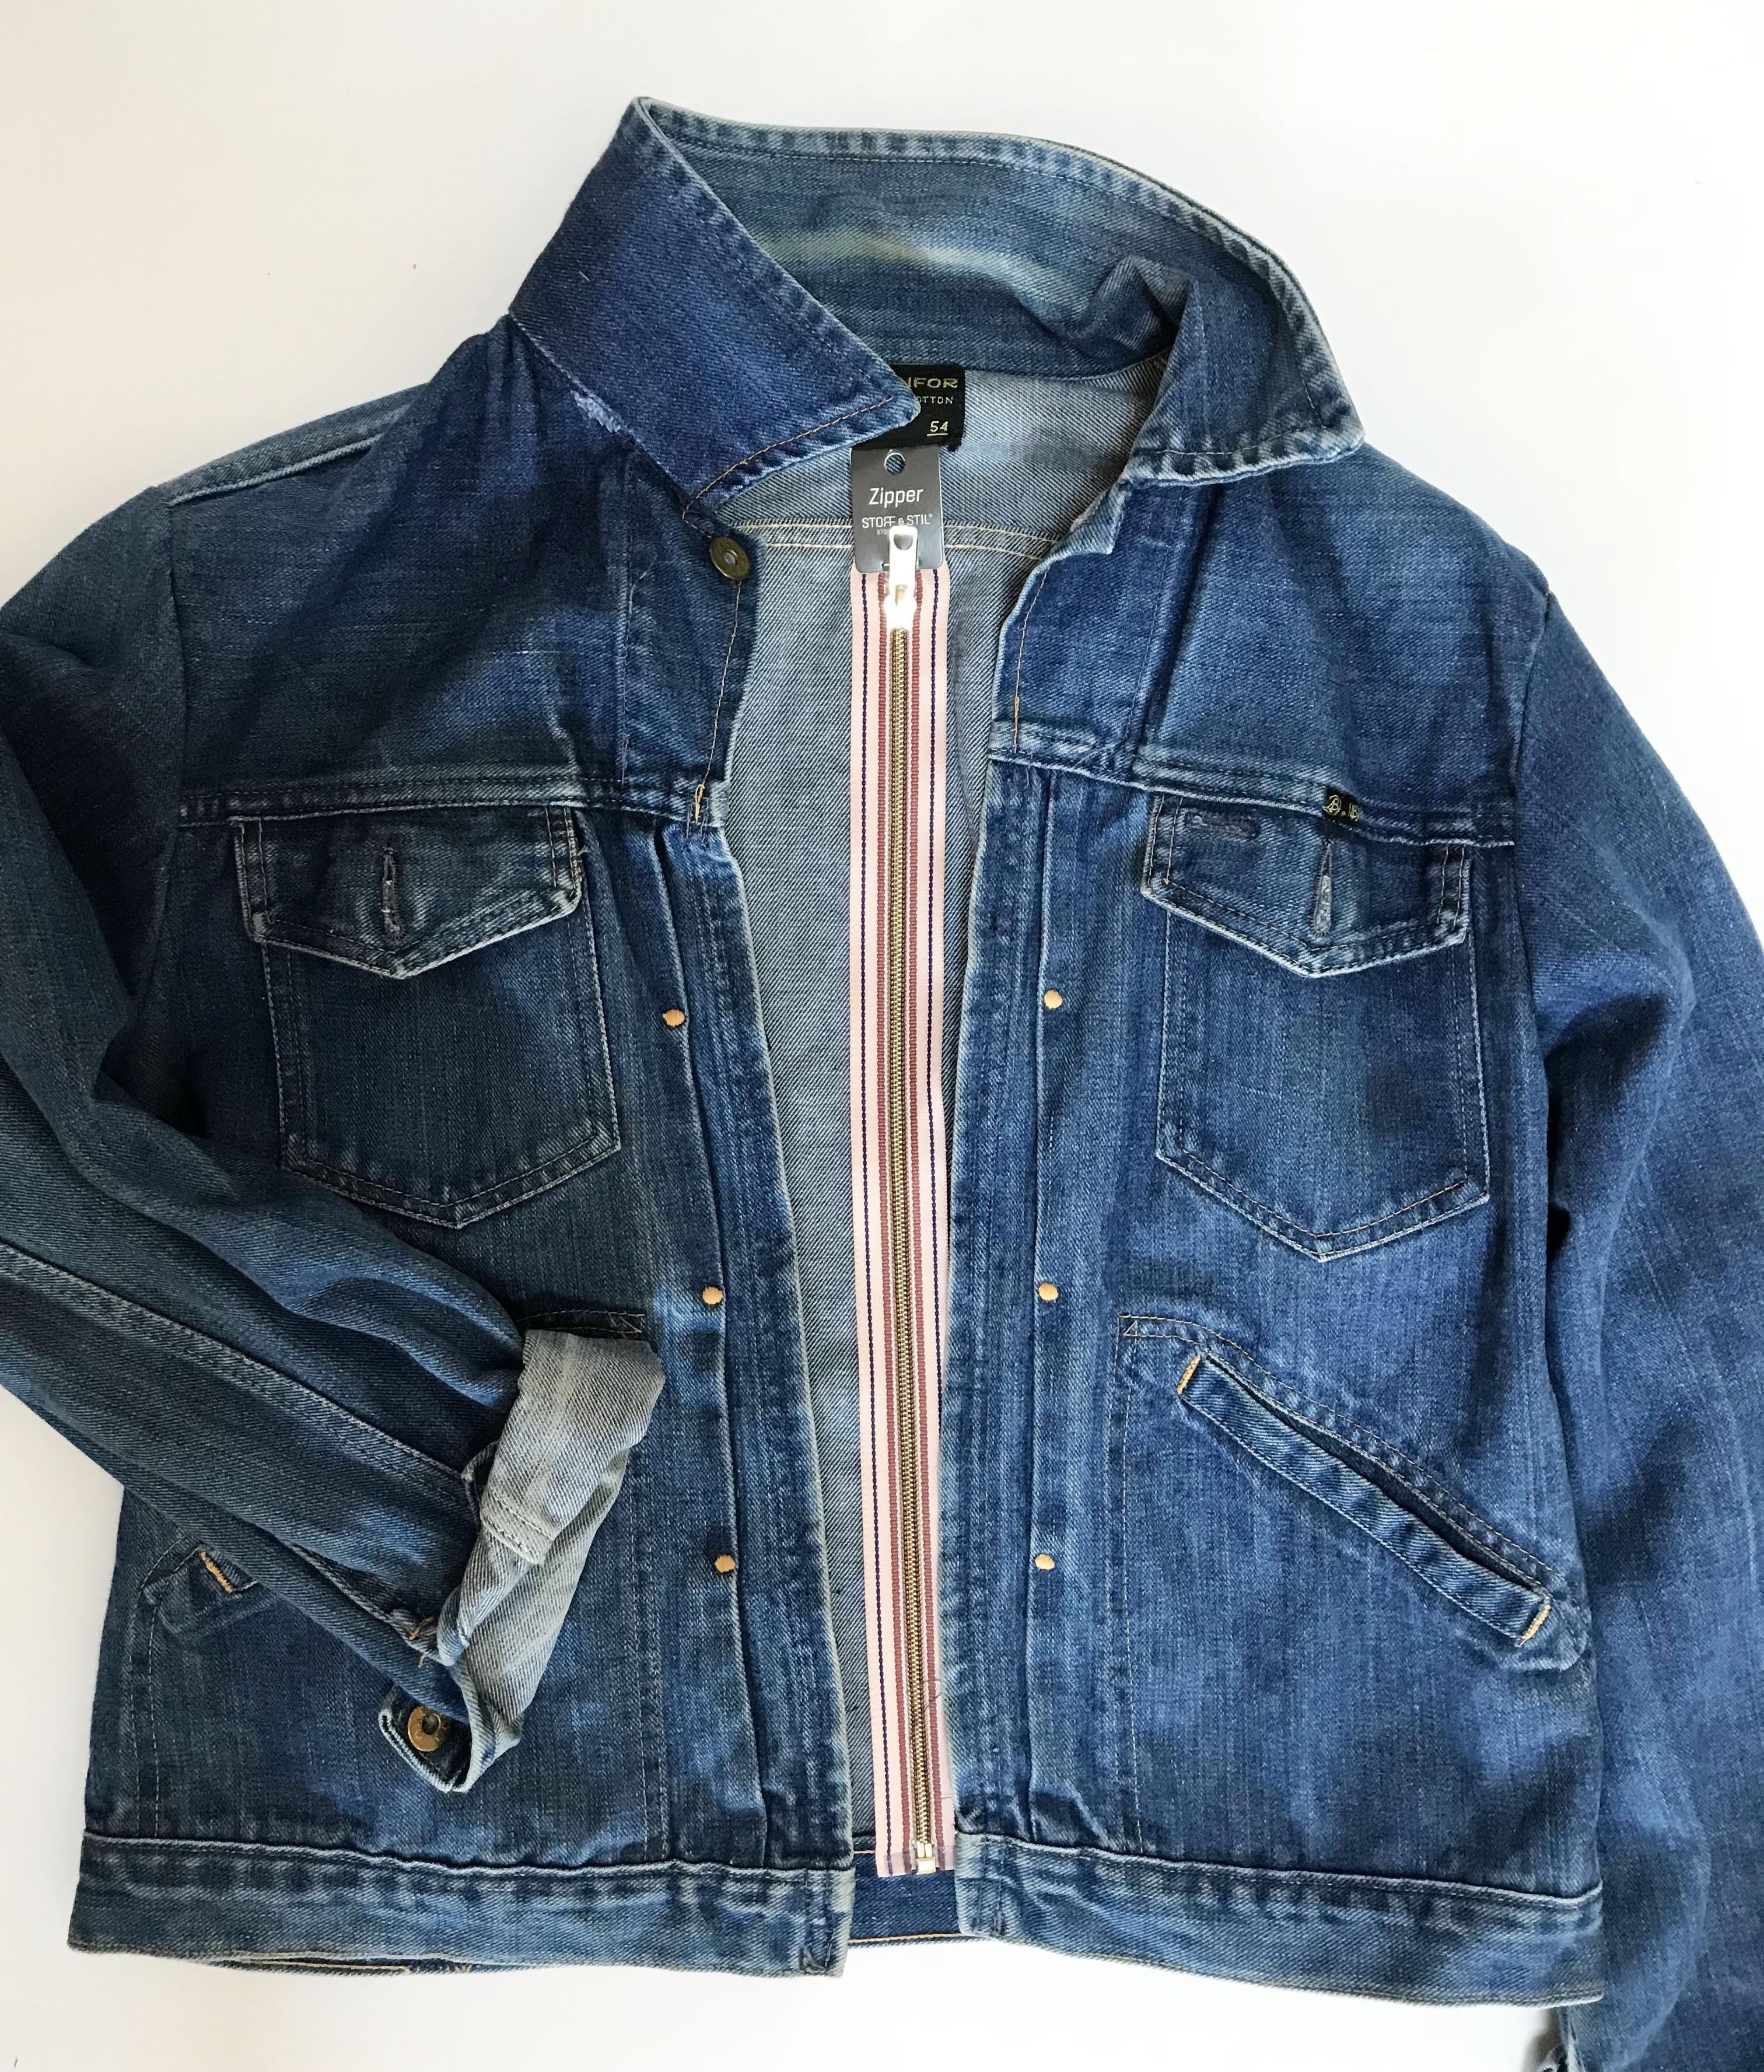 The old denim jacket that never dies